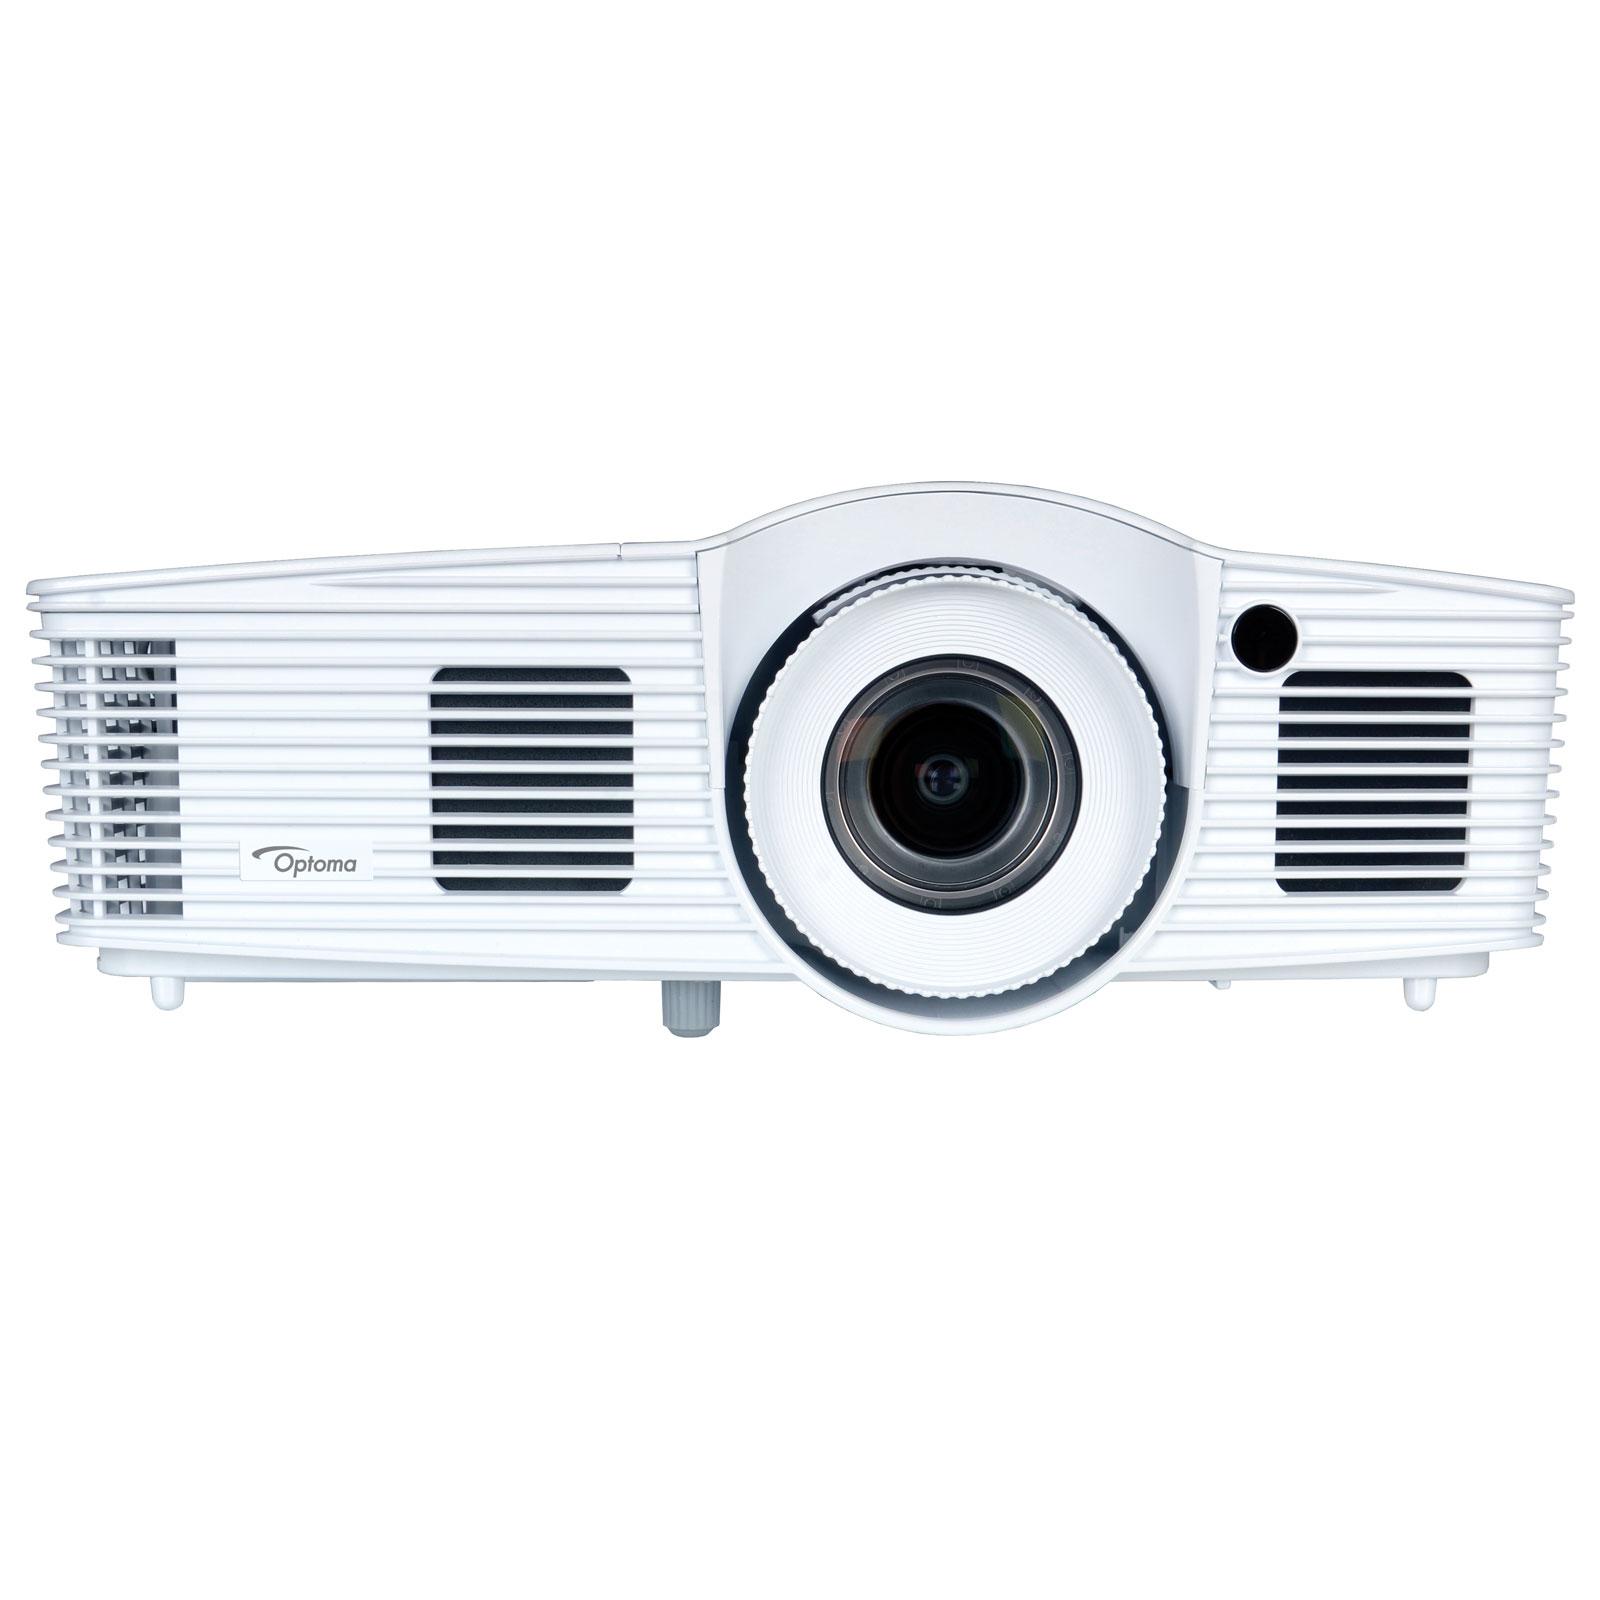 Optoma du400 vid oprojecteur optoma sur - Support plafond videoprojecteur optoma ...